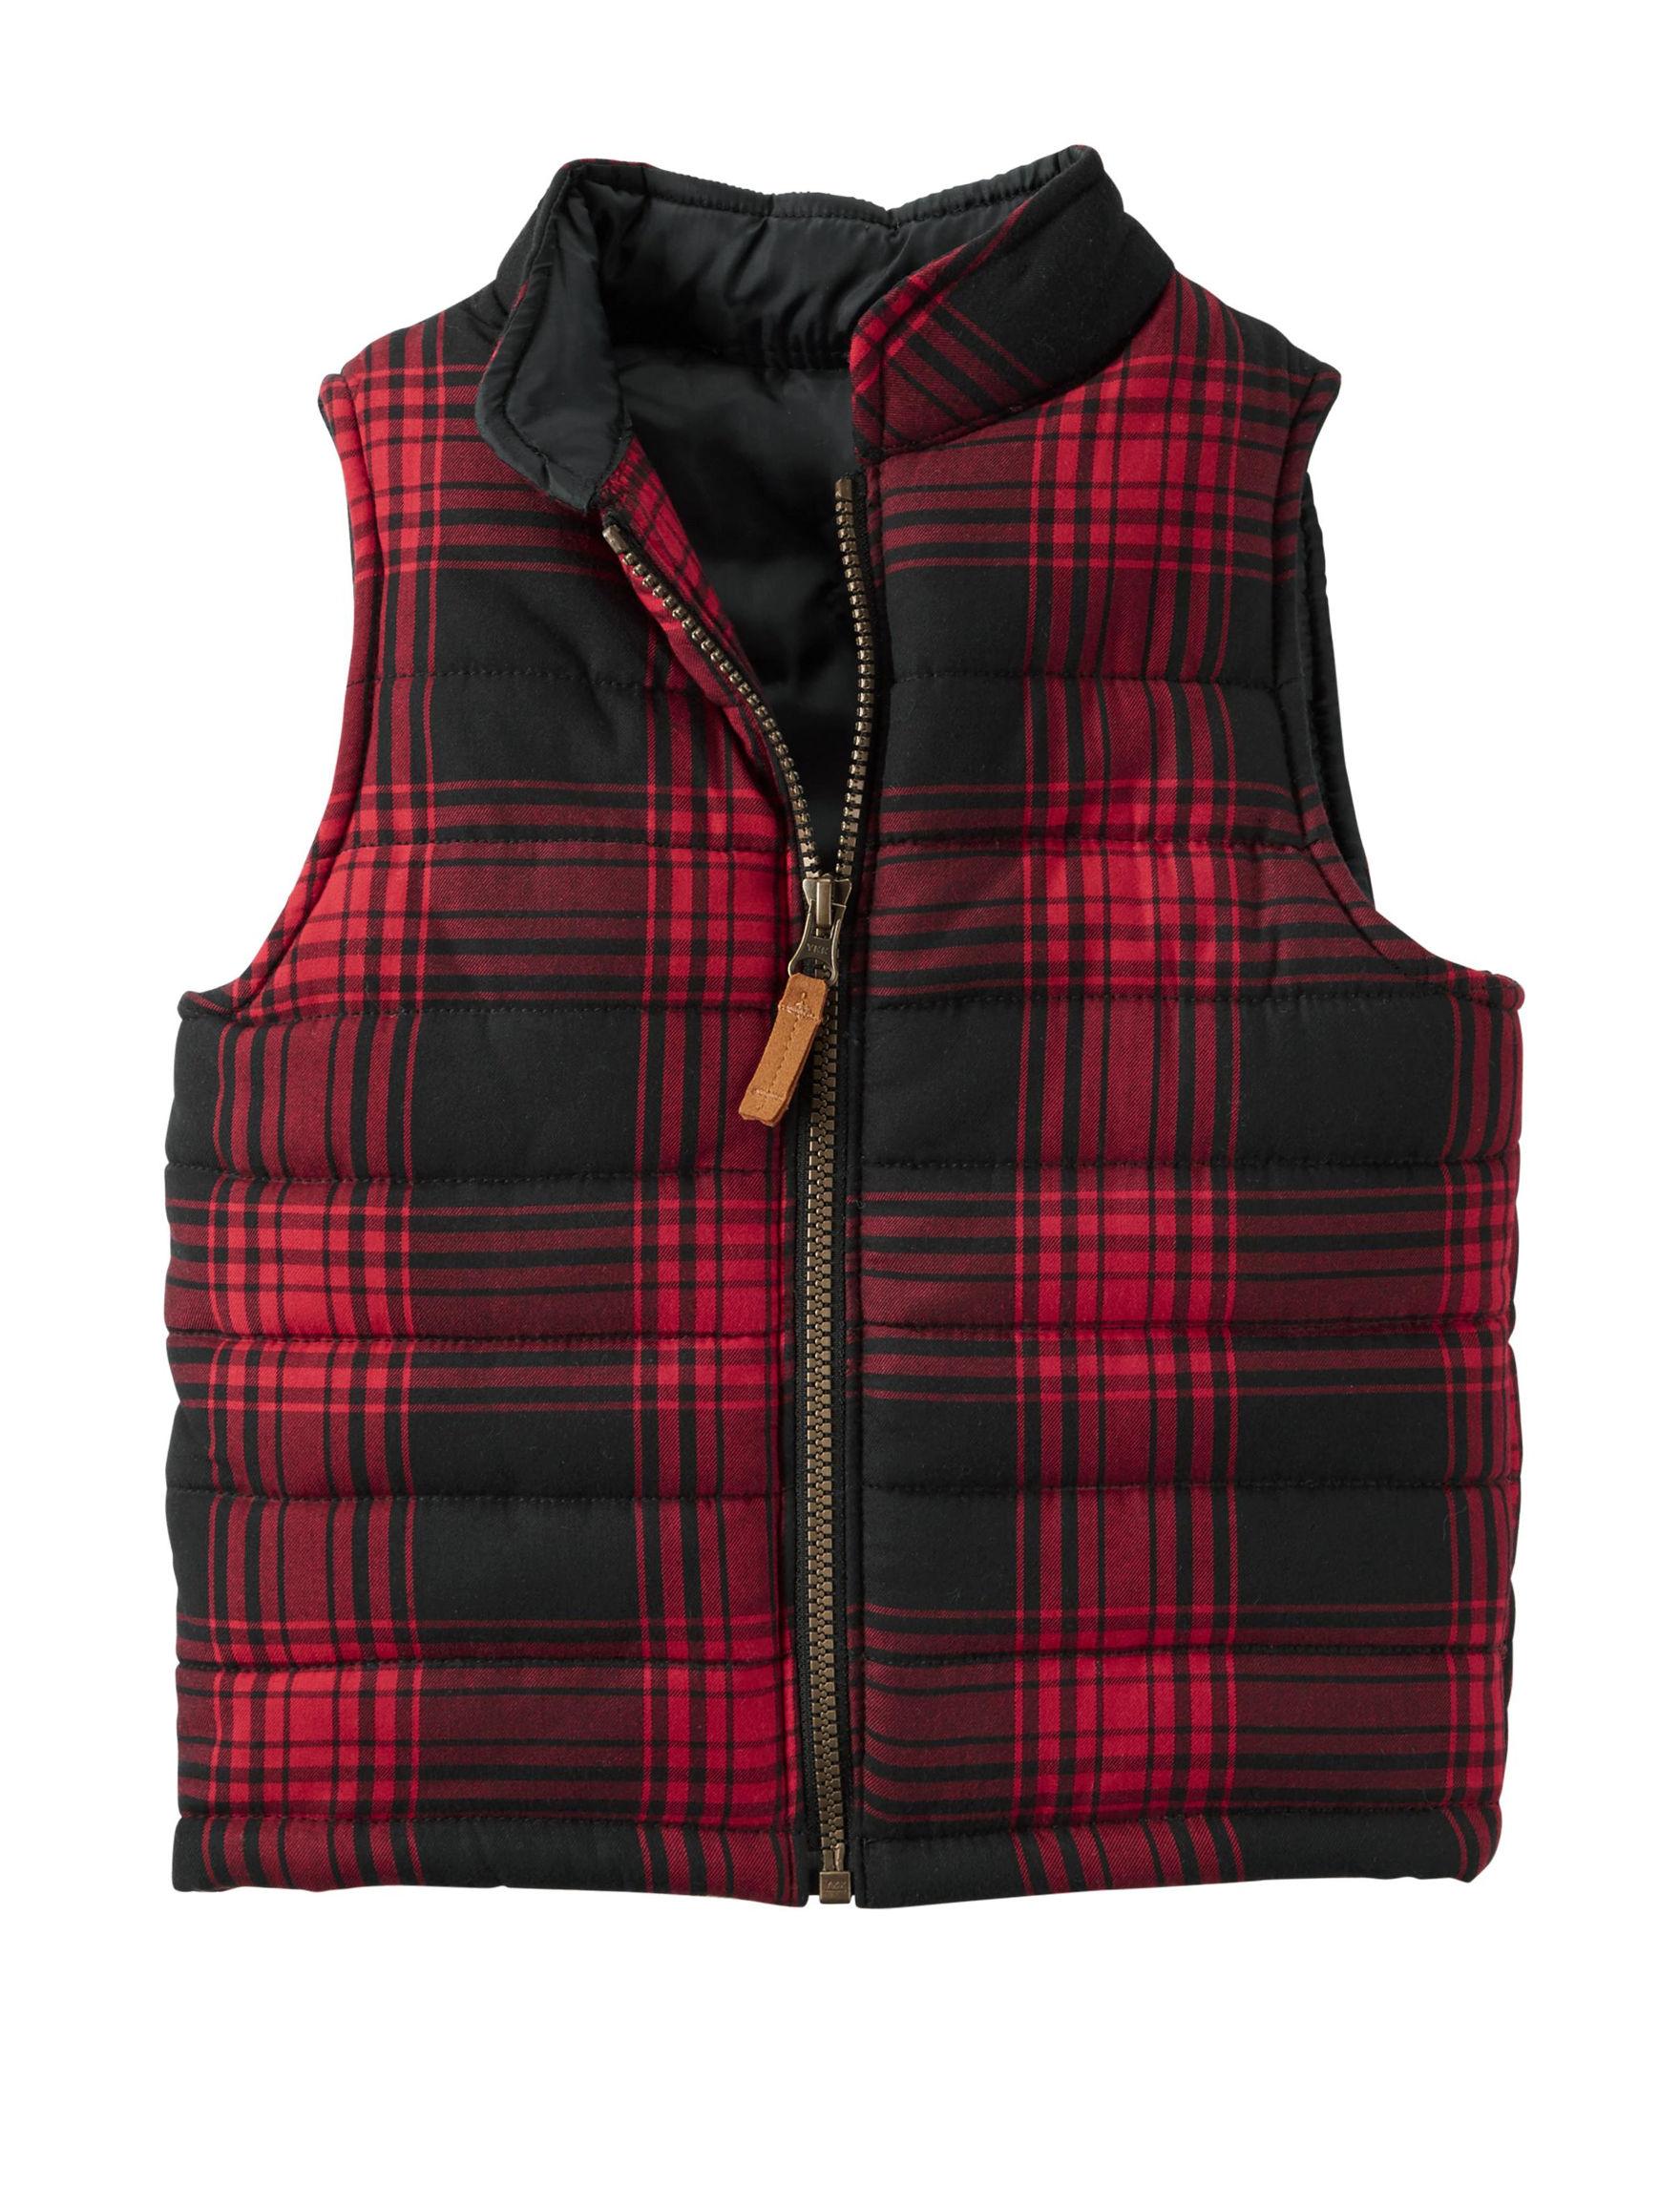 Carter's Plaid Fleece & Soft Shell Jackets